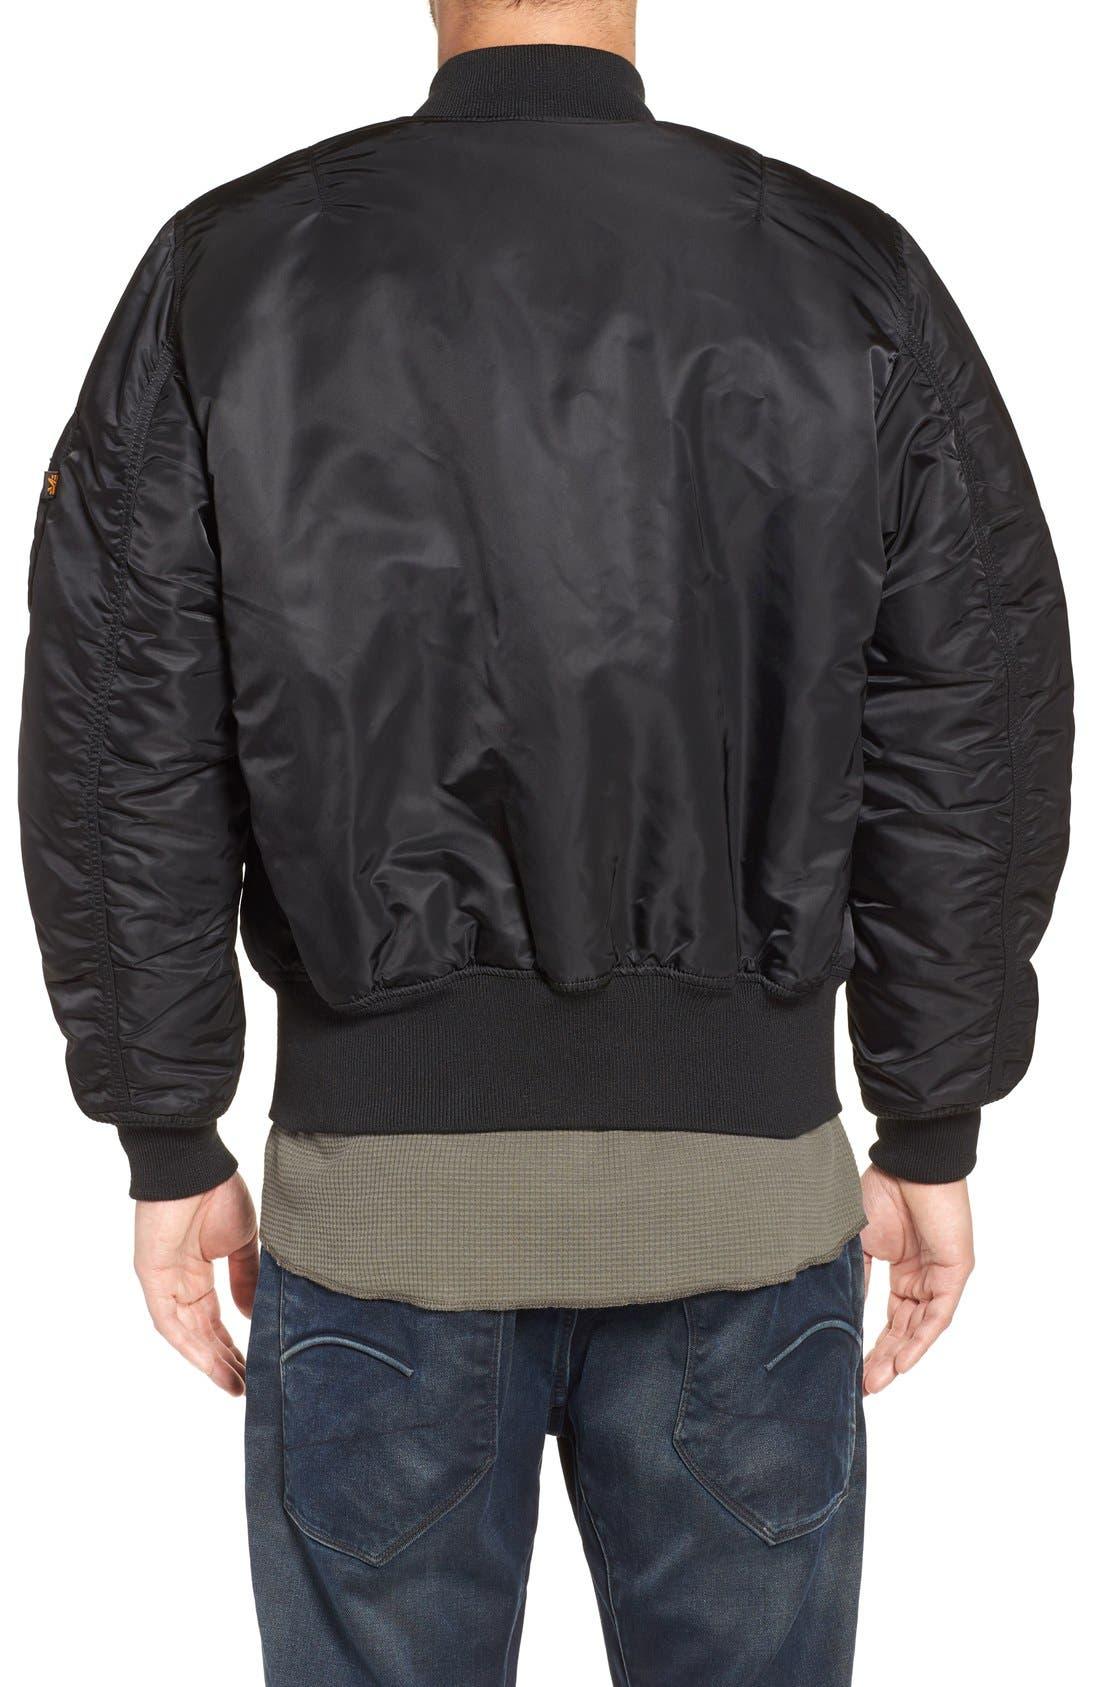 'MA-1' Slim Fit Bomber Jacket,                             Alternate thumbnail 3, color,                             BLACK